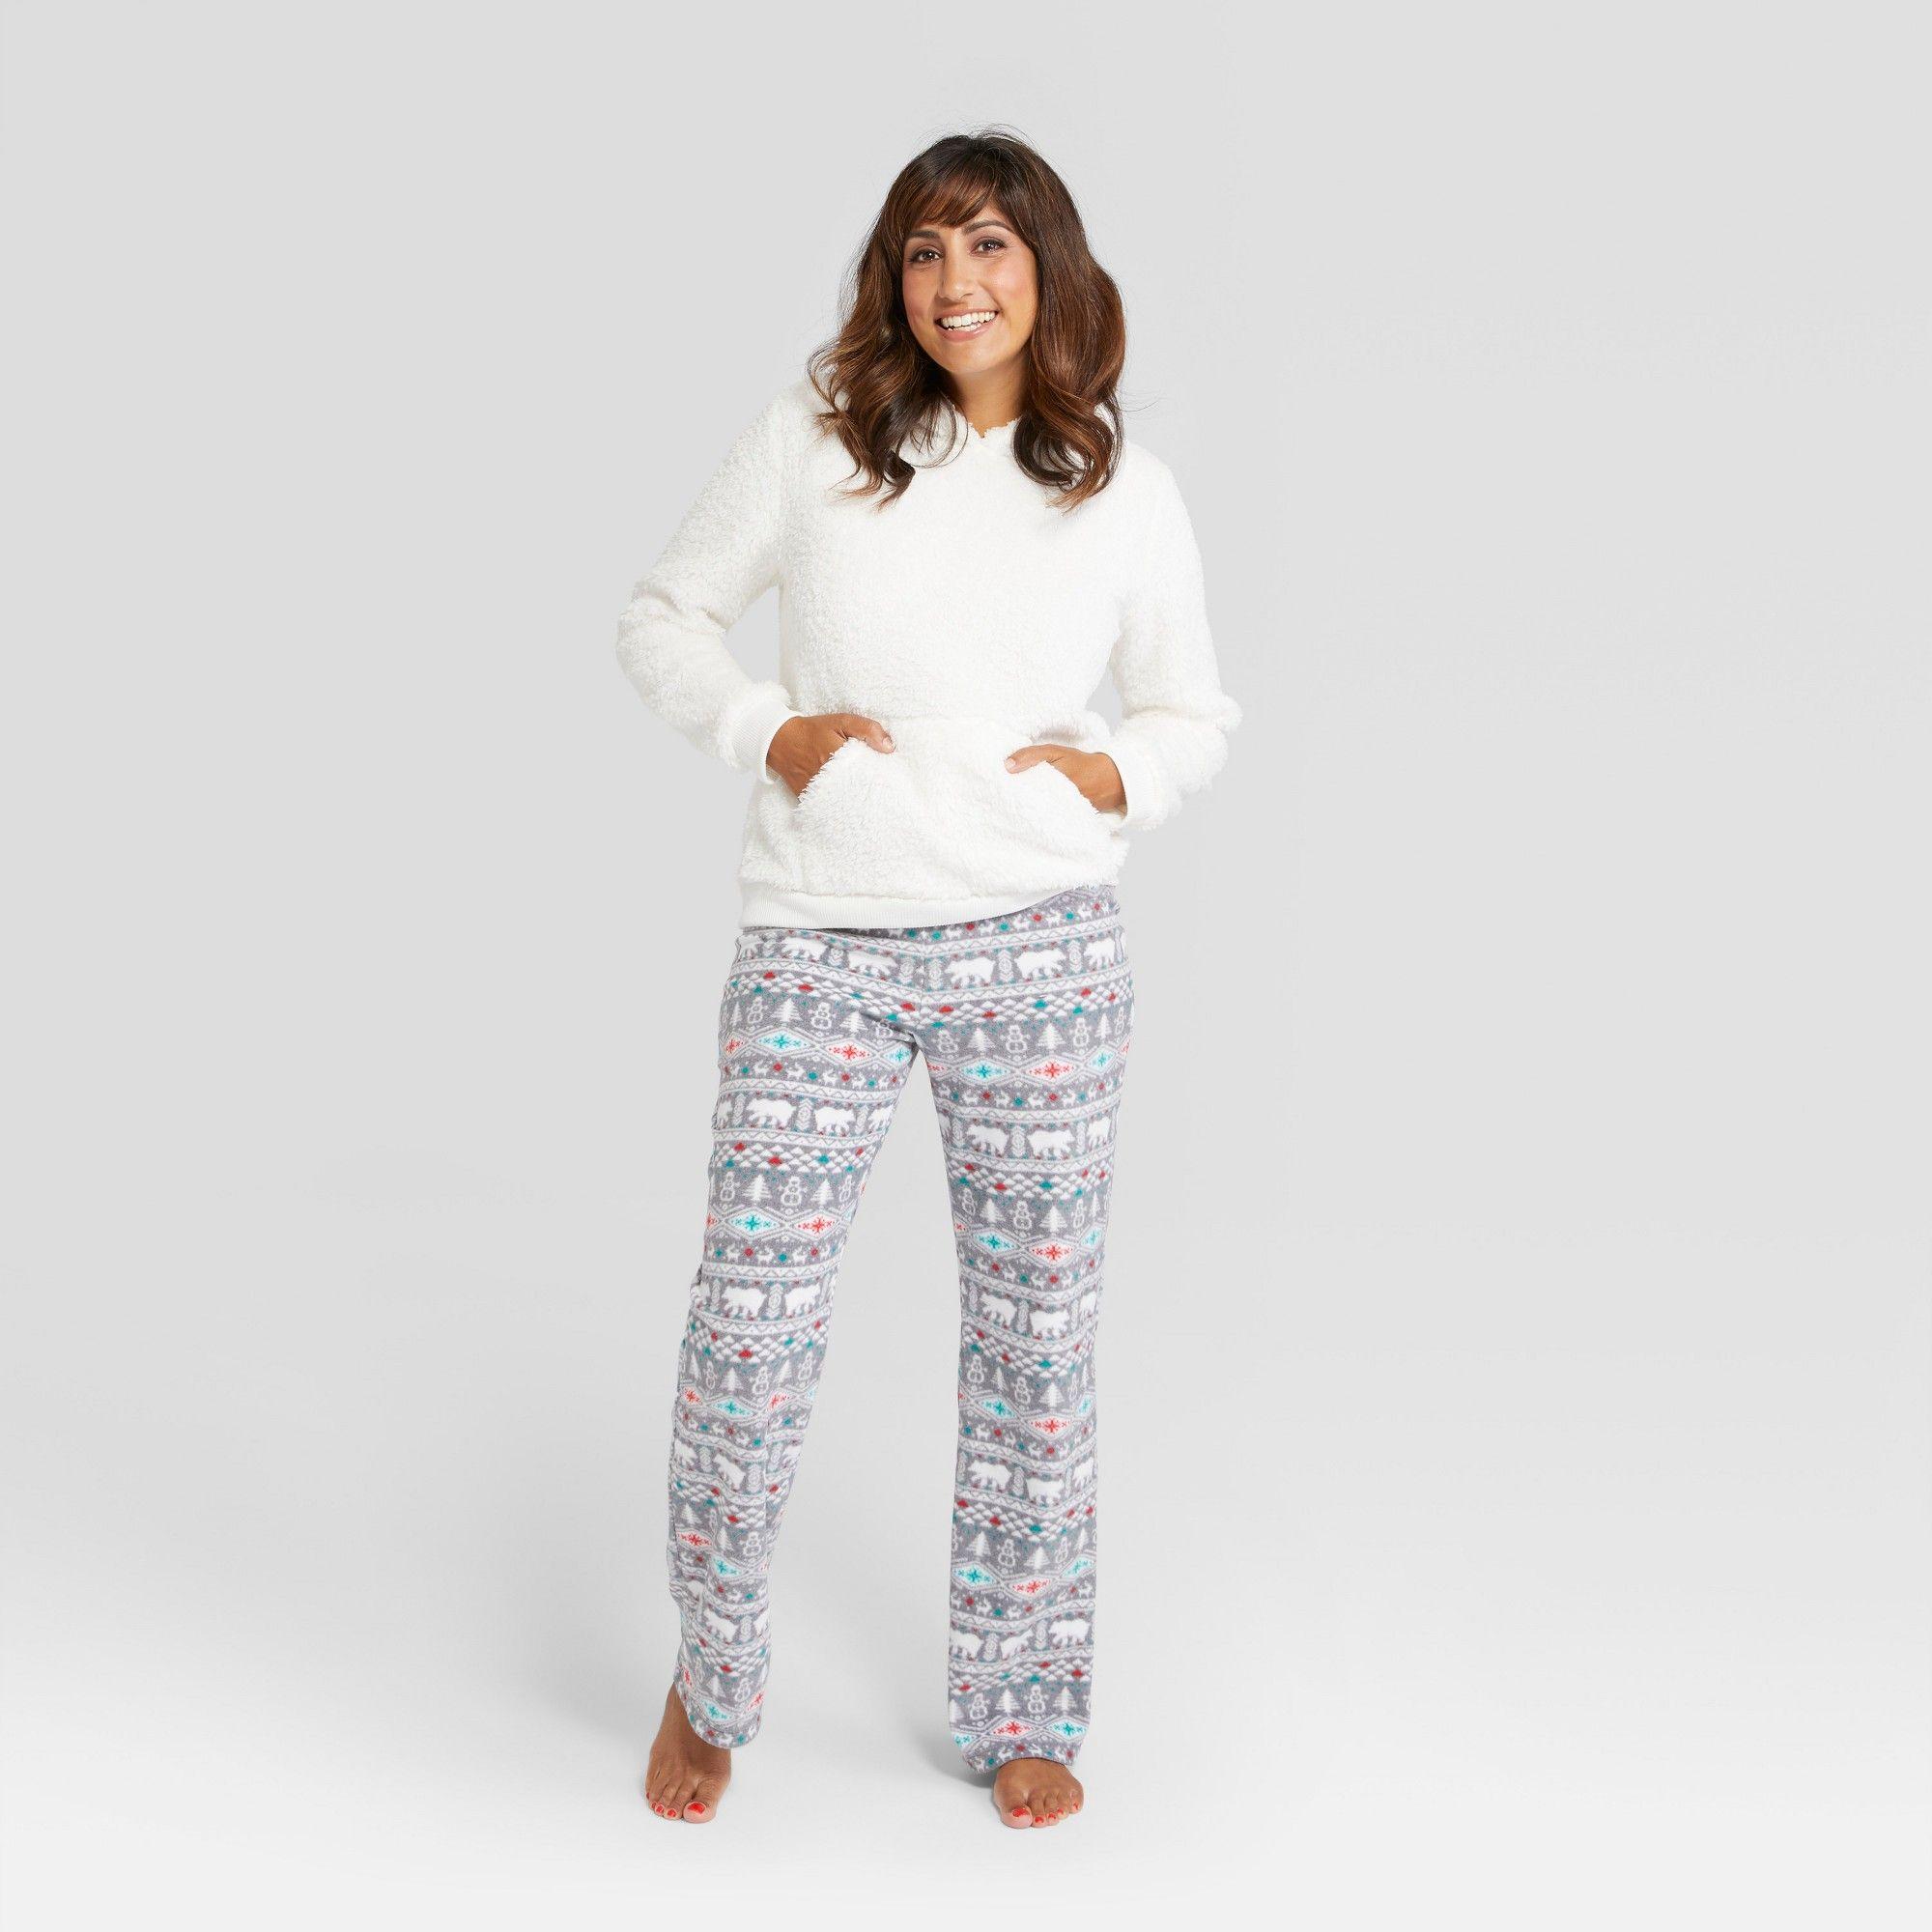 7fef16b9b4 Women s Holiday Fuzzy Bear Fair Isle Pajama Set - Wondershop White S ...